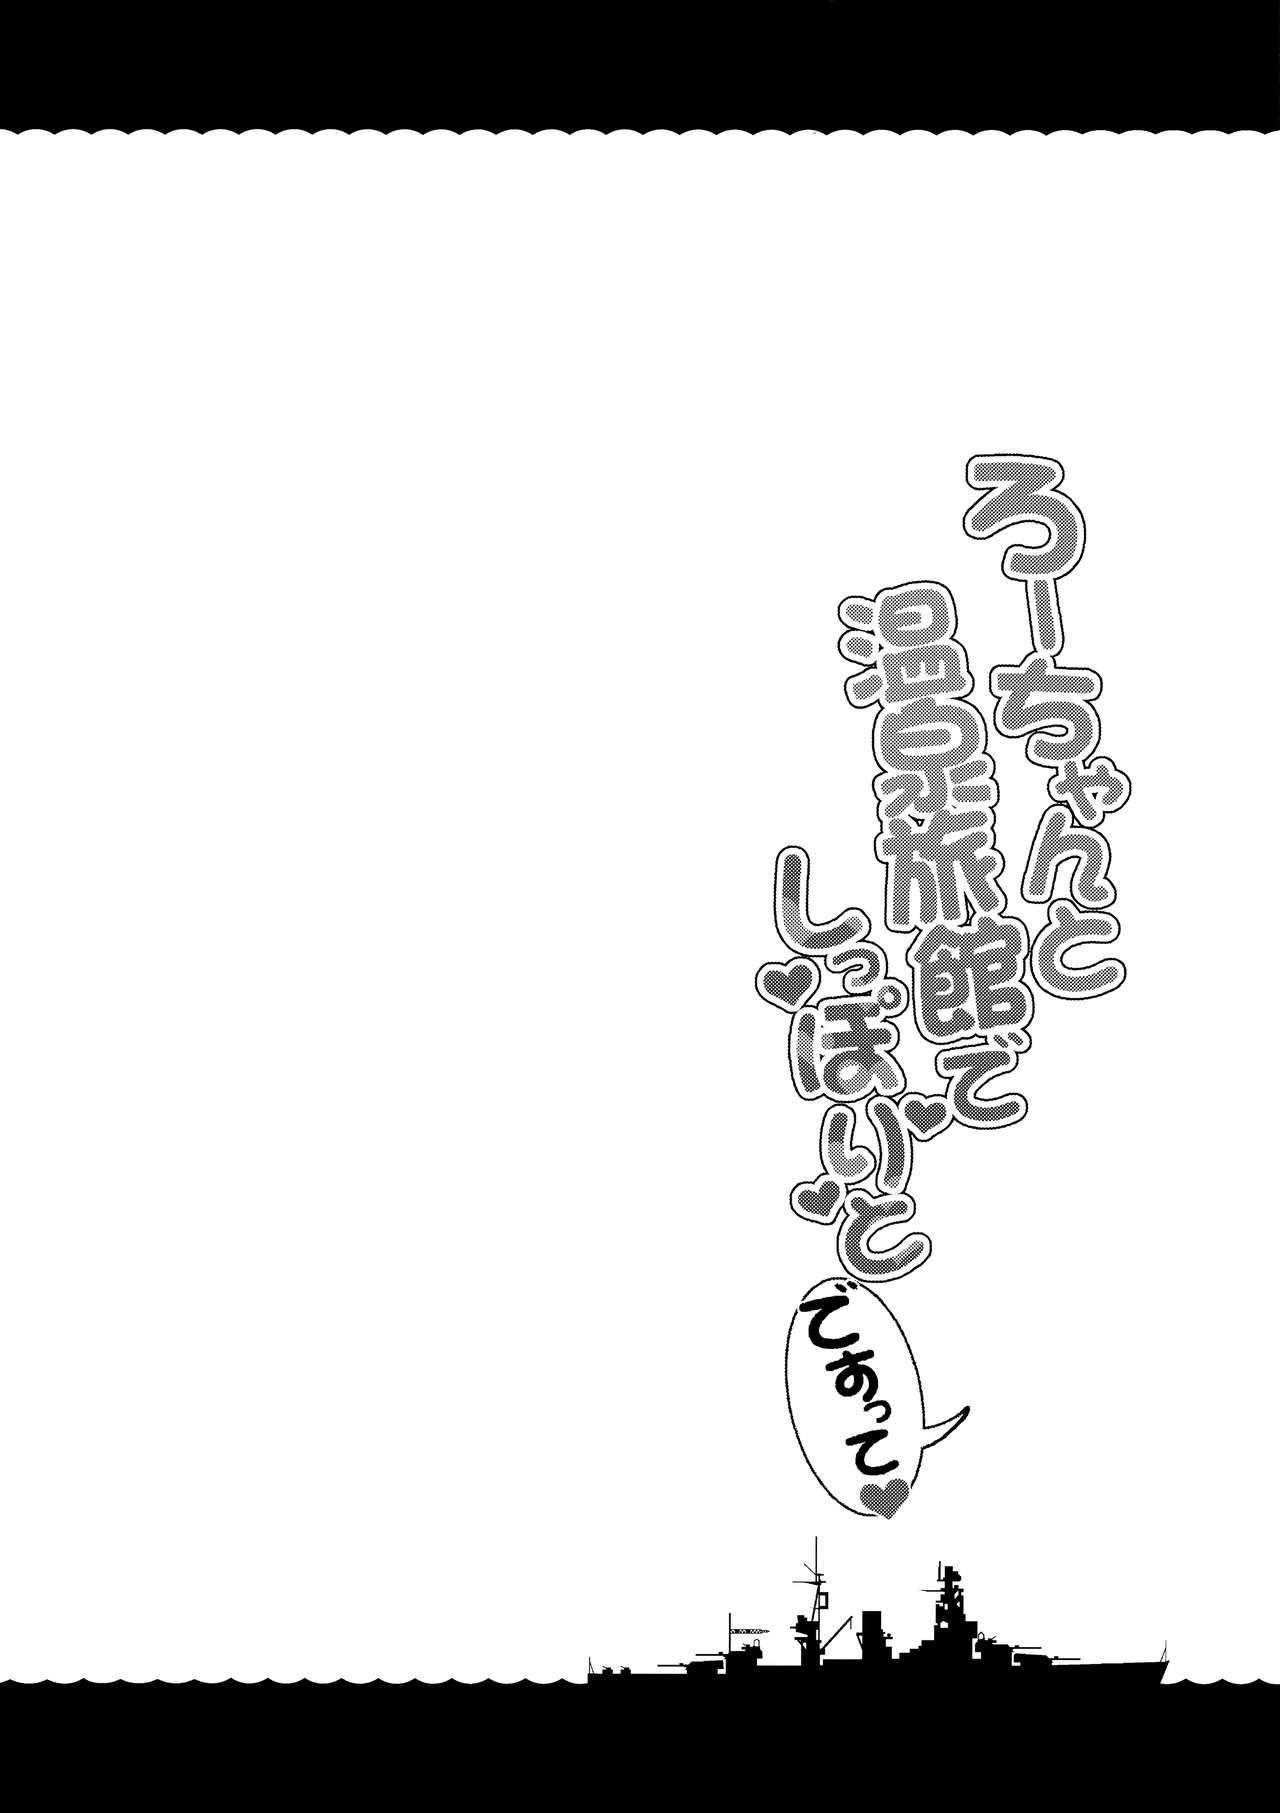 (C92) [Takoyaki-batake (Takoyaki Yoshi)] Ro-chan to Onsen Ryokan de Shippori to desutte   Relaxing With Ro-chan at a Hot Spring Inn. (Kantai Collection -KanColle-) [English] [ATF] 2